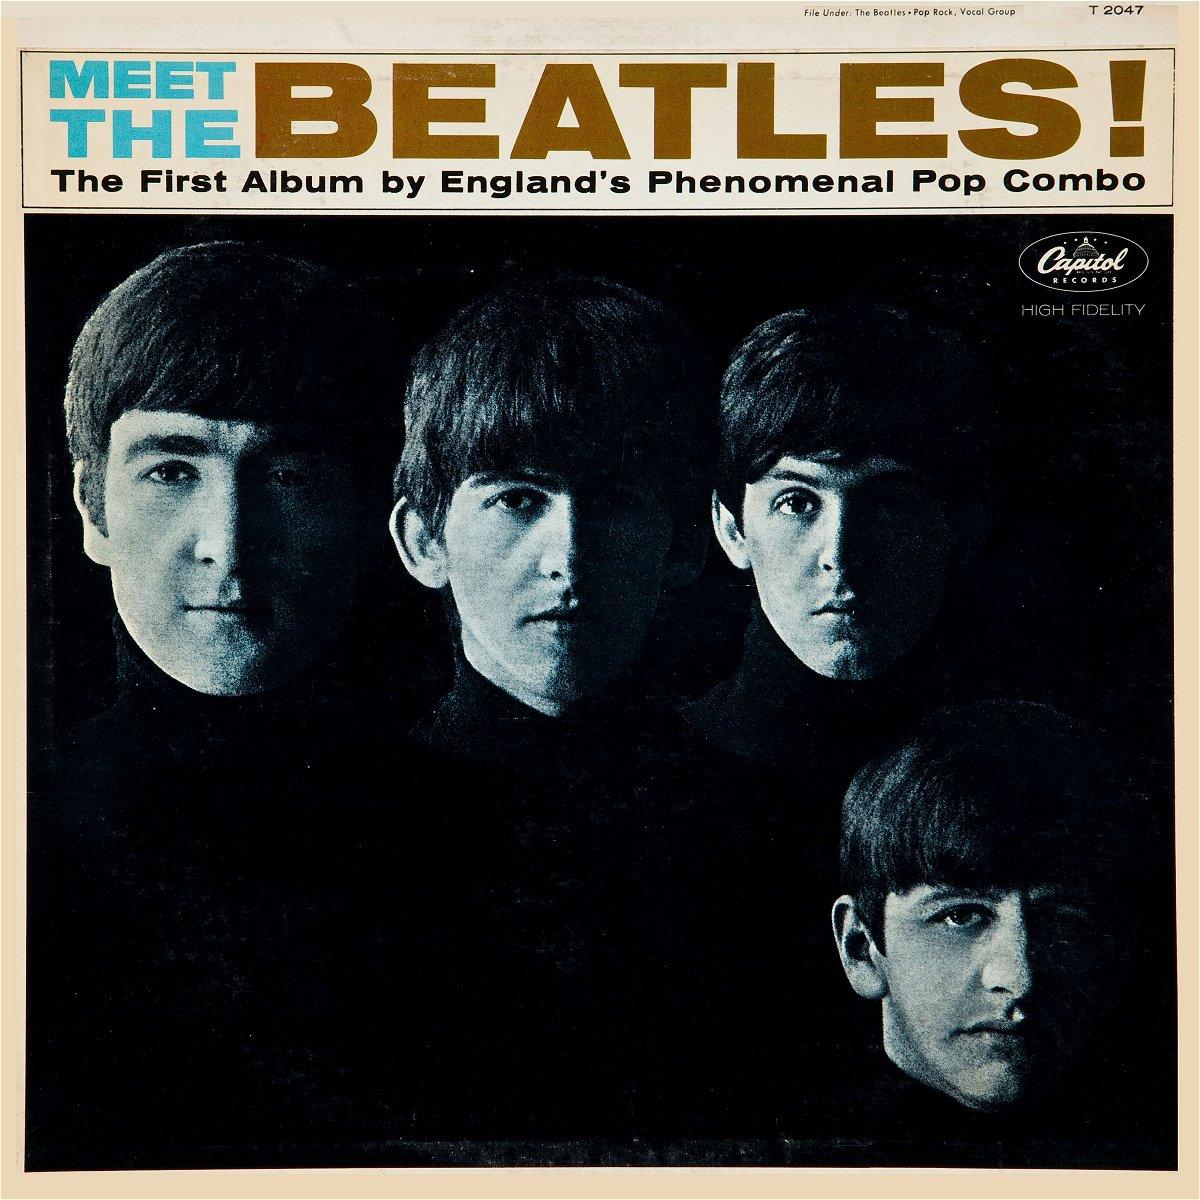 Beatles MIDI/MP3 Music Homepage - Meet The Beatles